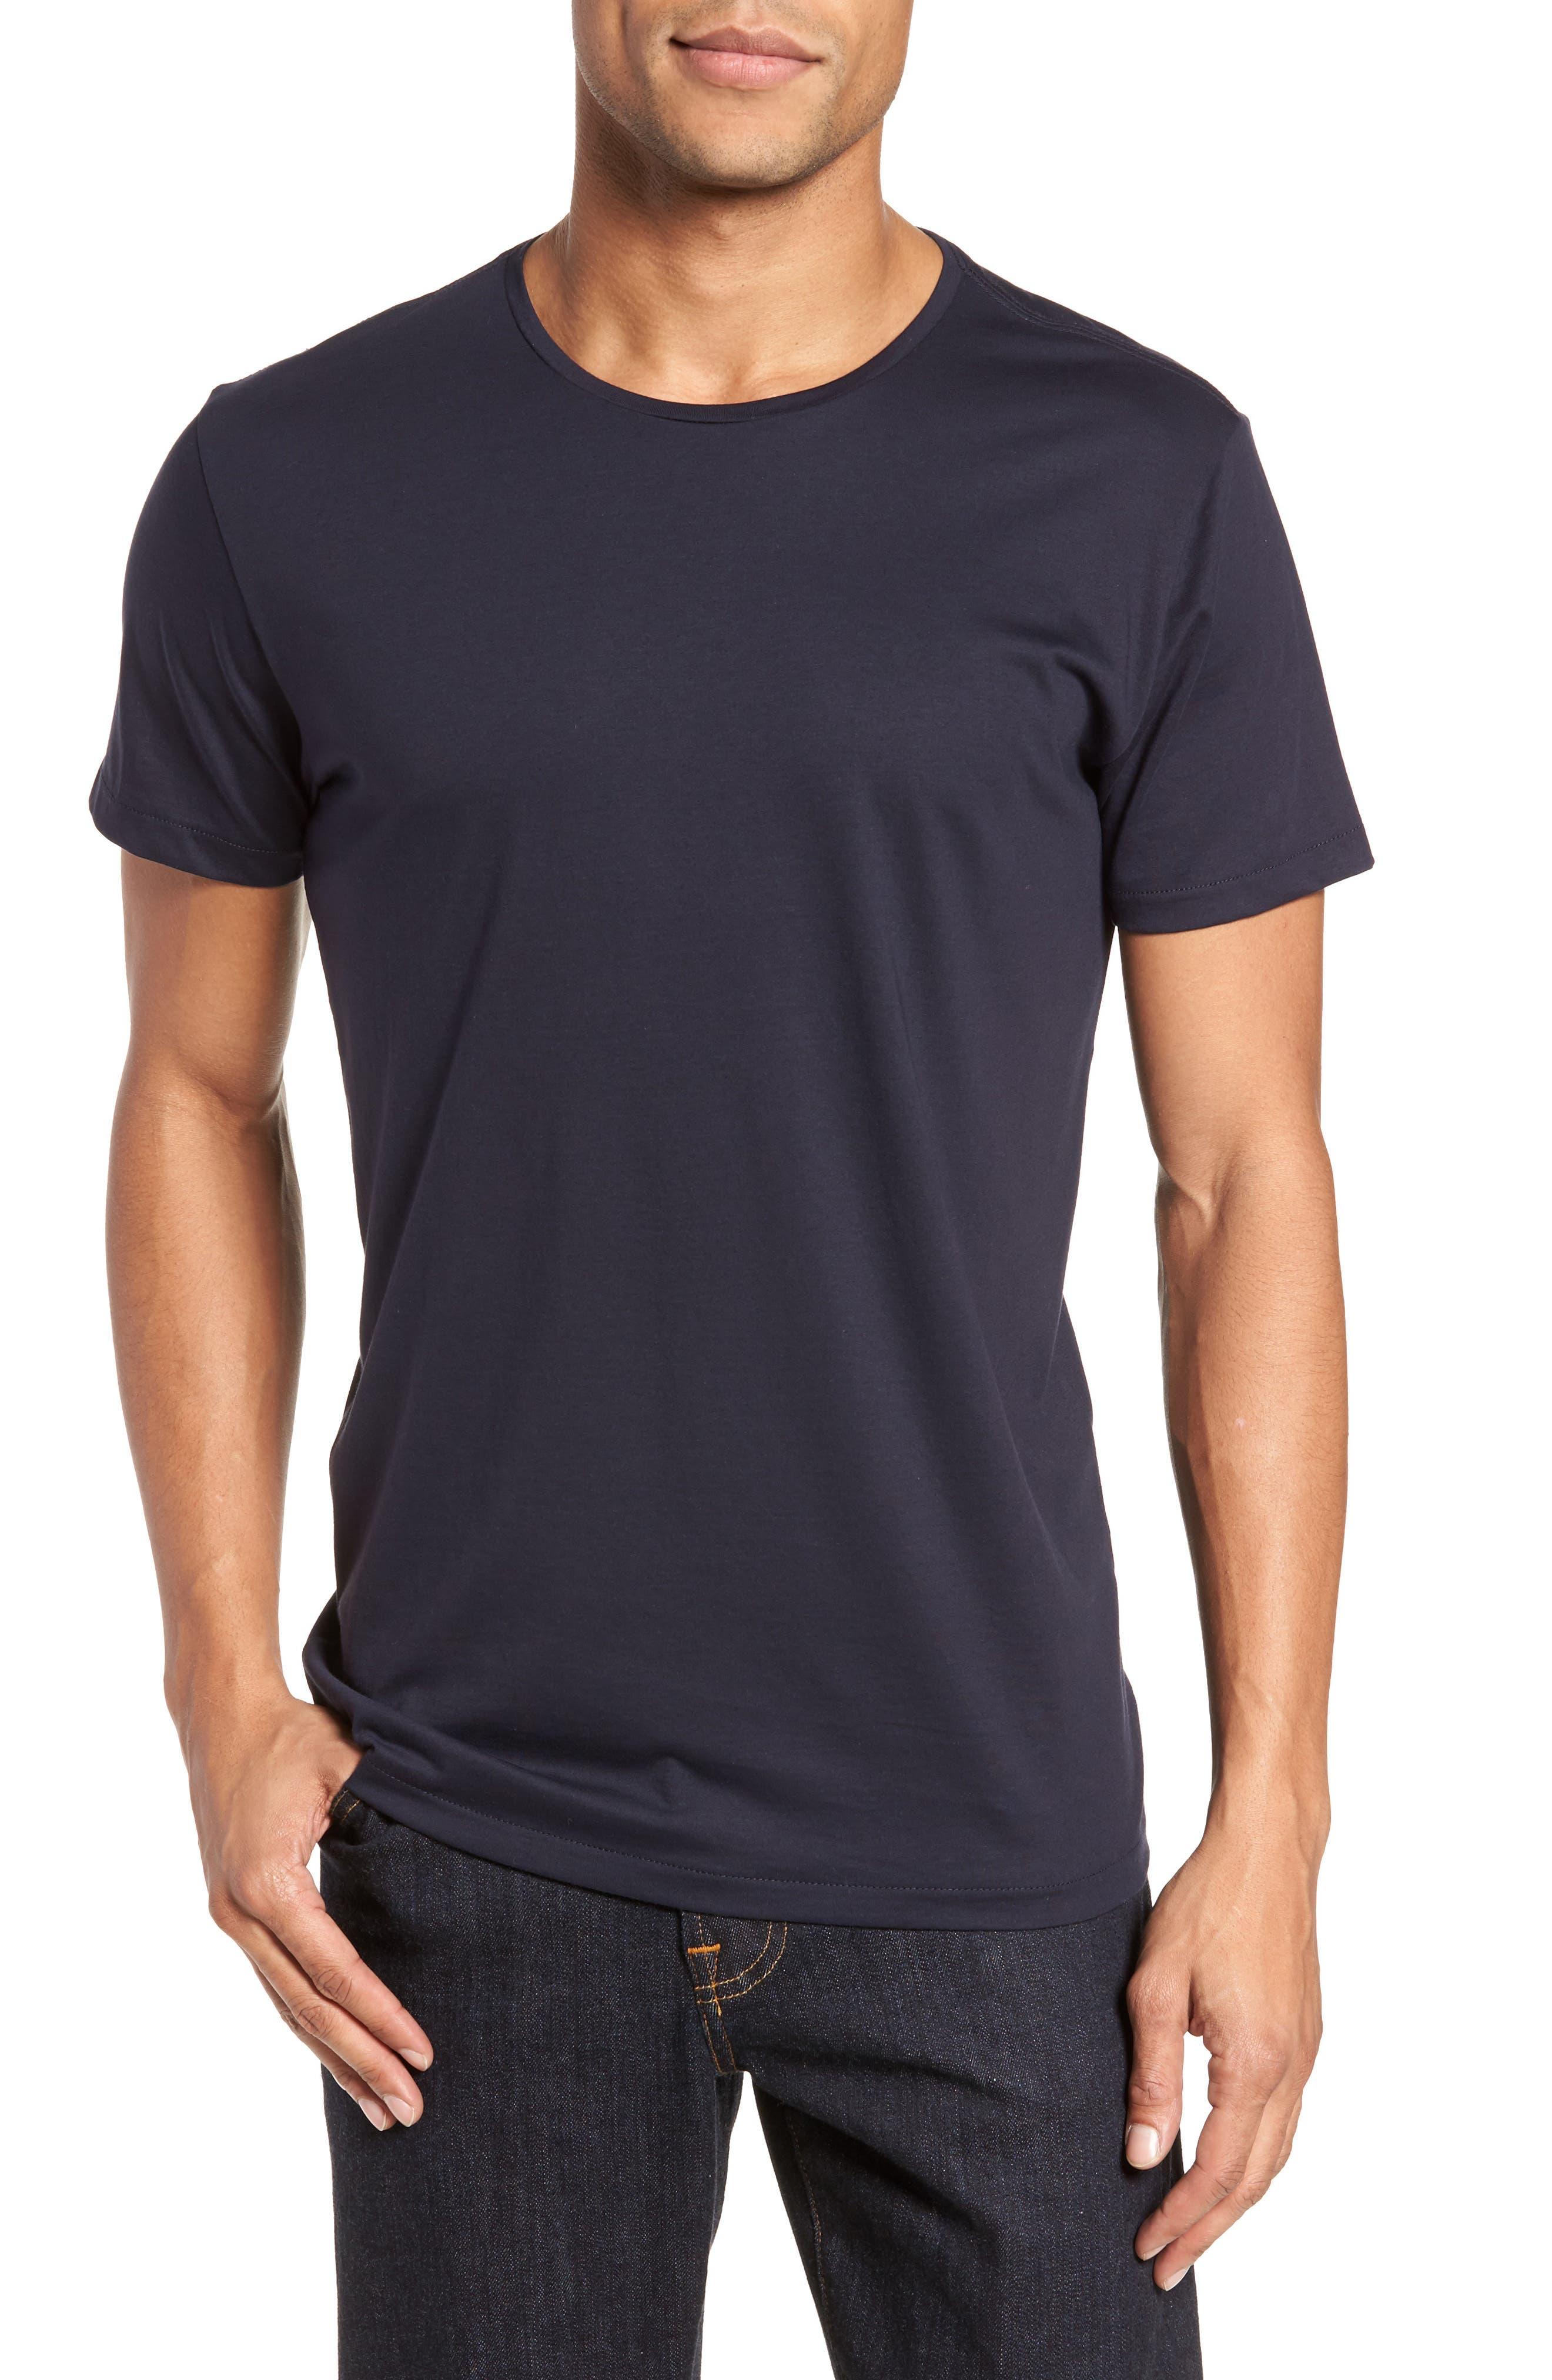 buy cheap Bonobos Refined T-Shirt